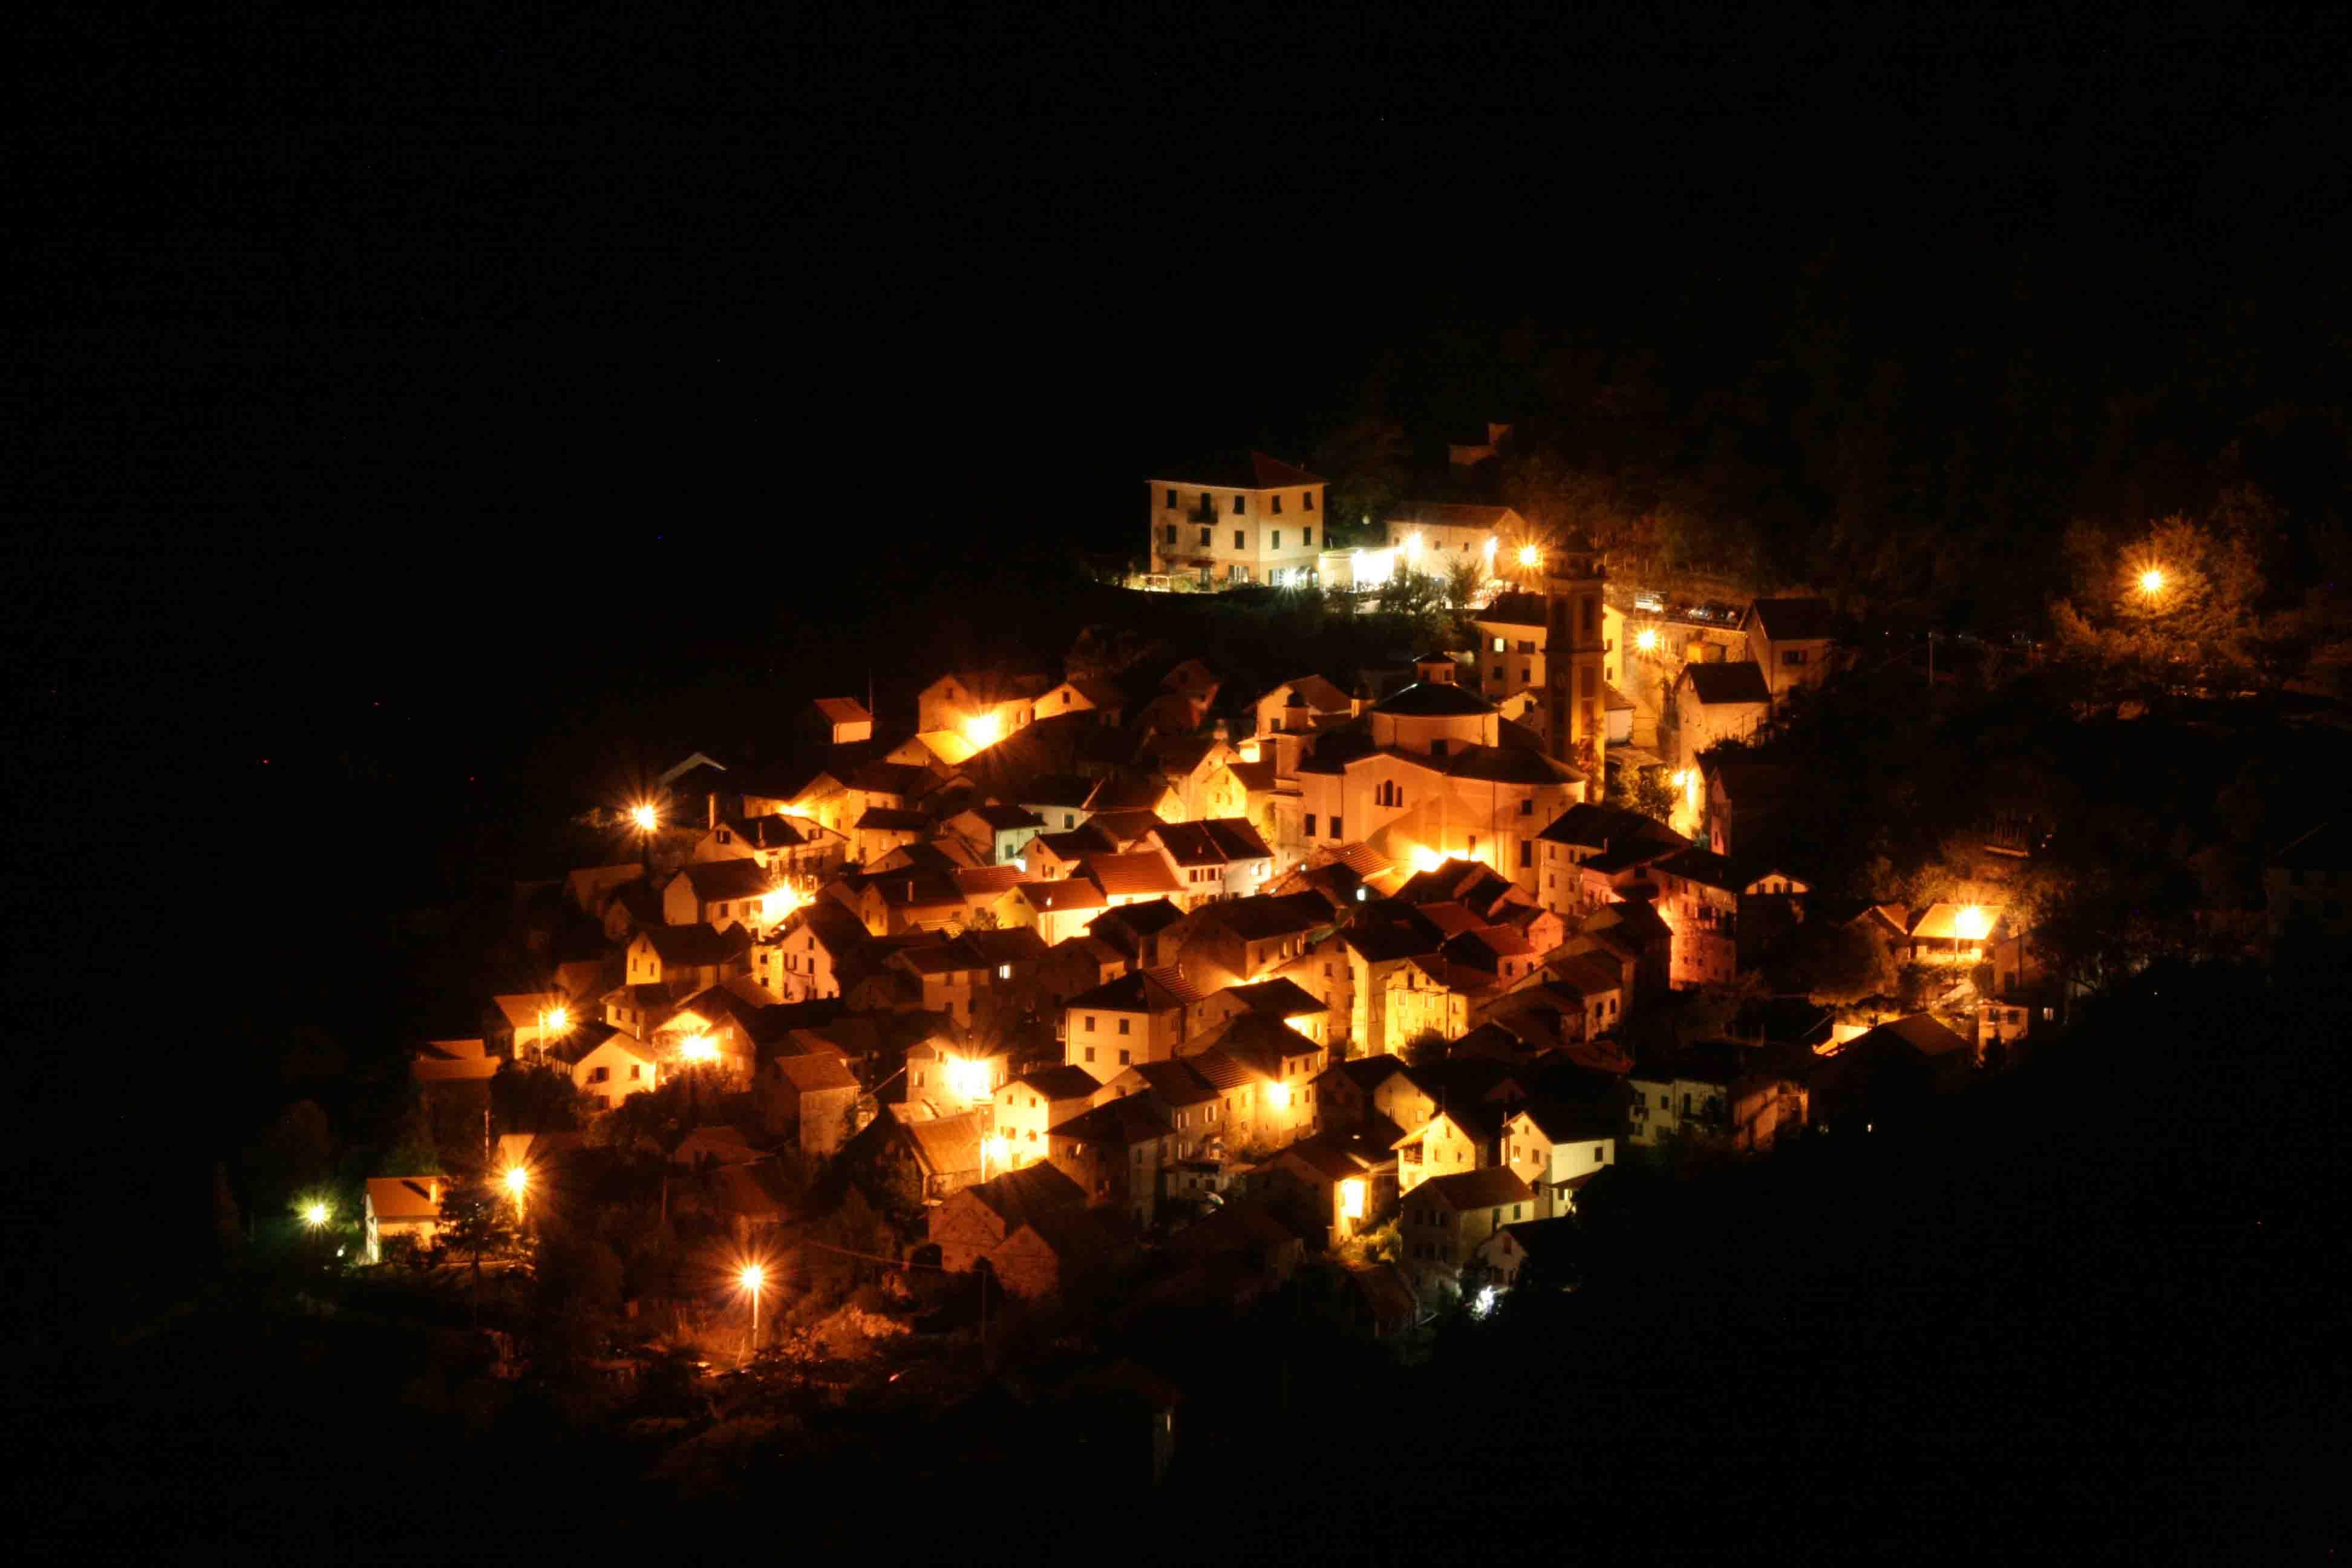 paese-di-notte